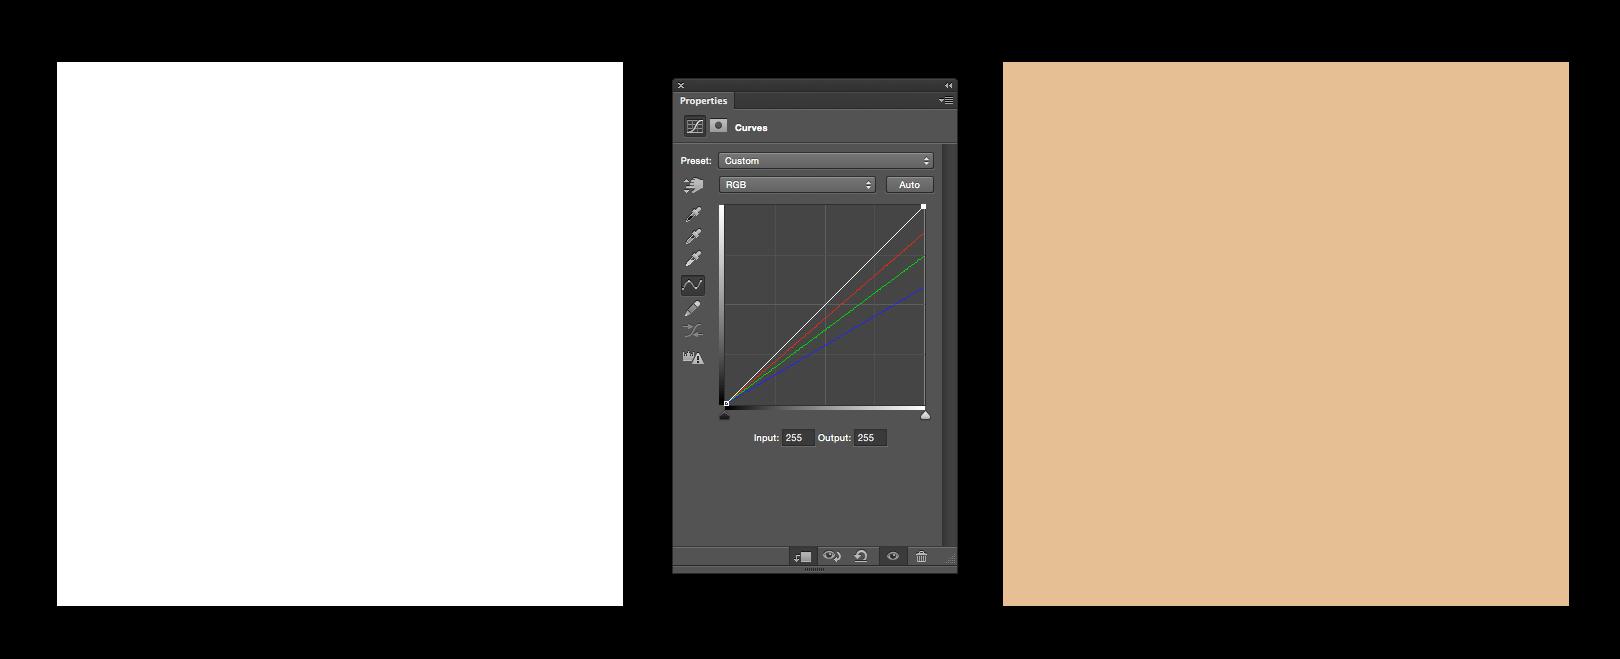 photoshop-curves-36